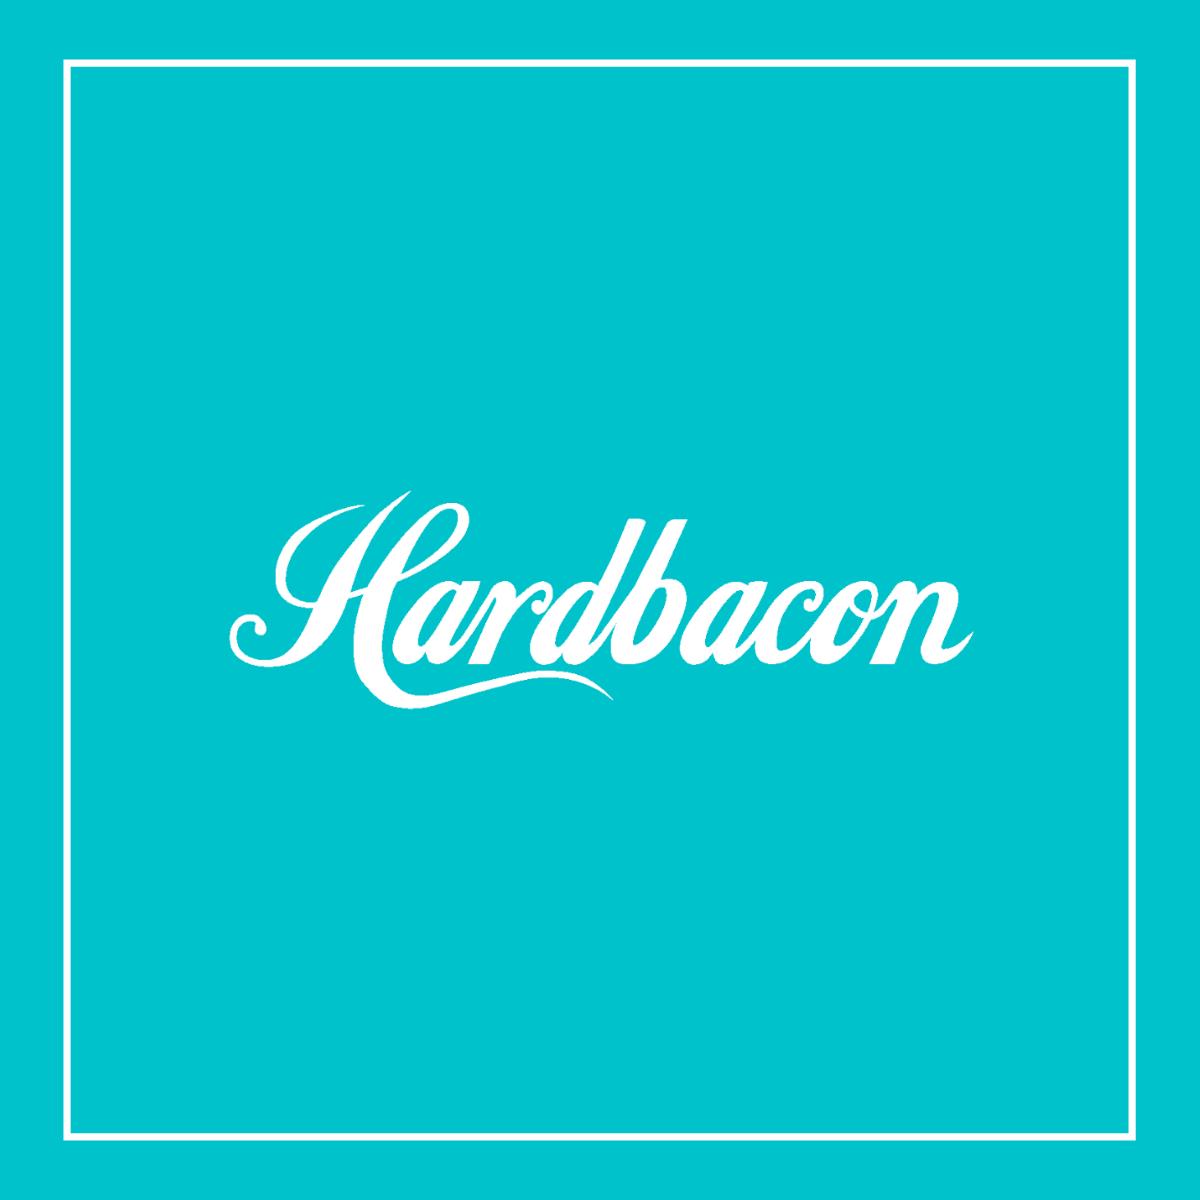 Hardbacon App Review